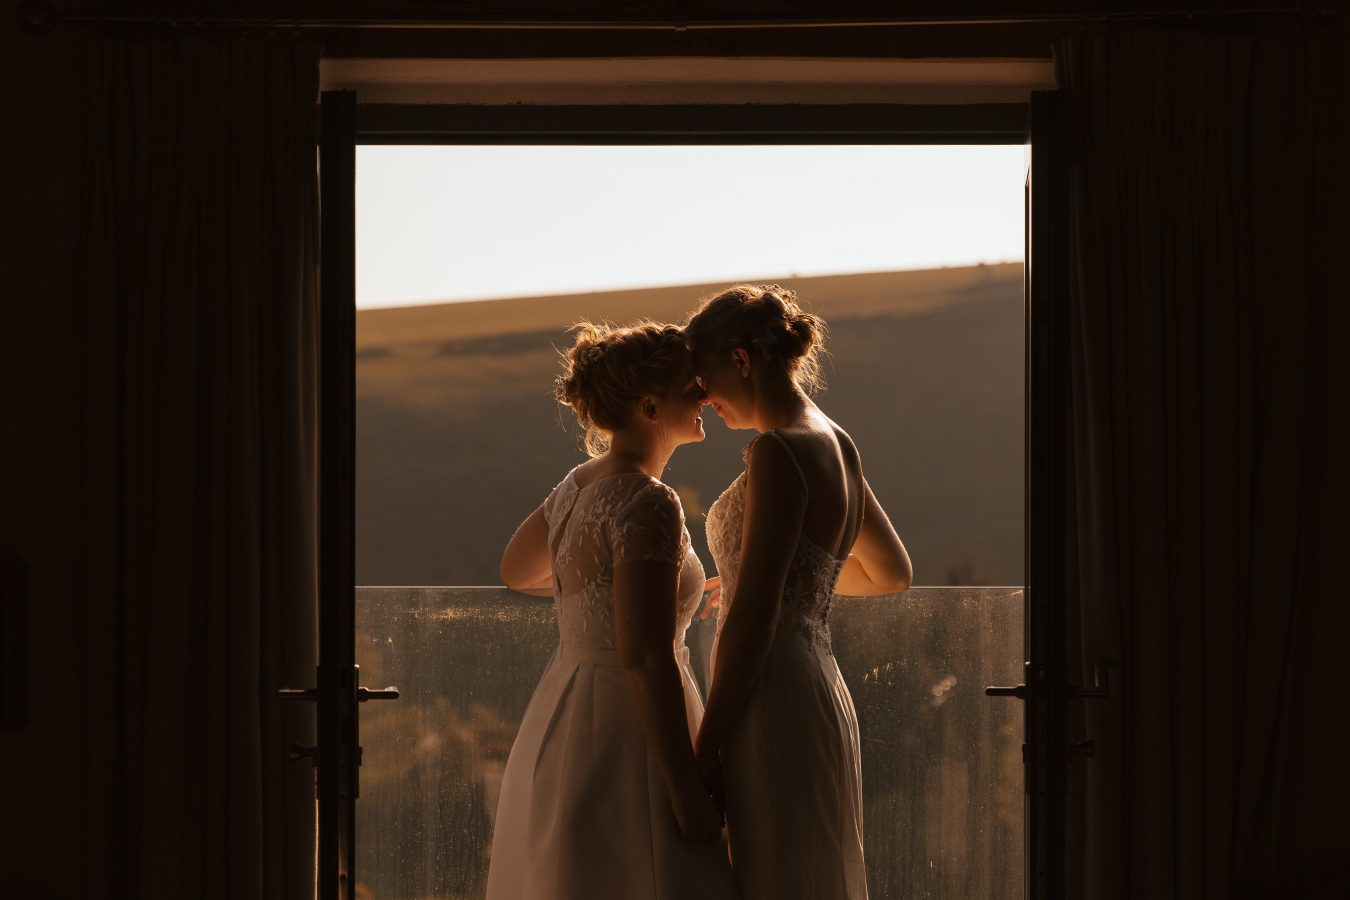 Tregulland-Barns-Wedding-Jules-Barron-Shelley-and-Ali-745